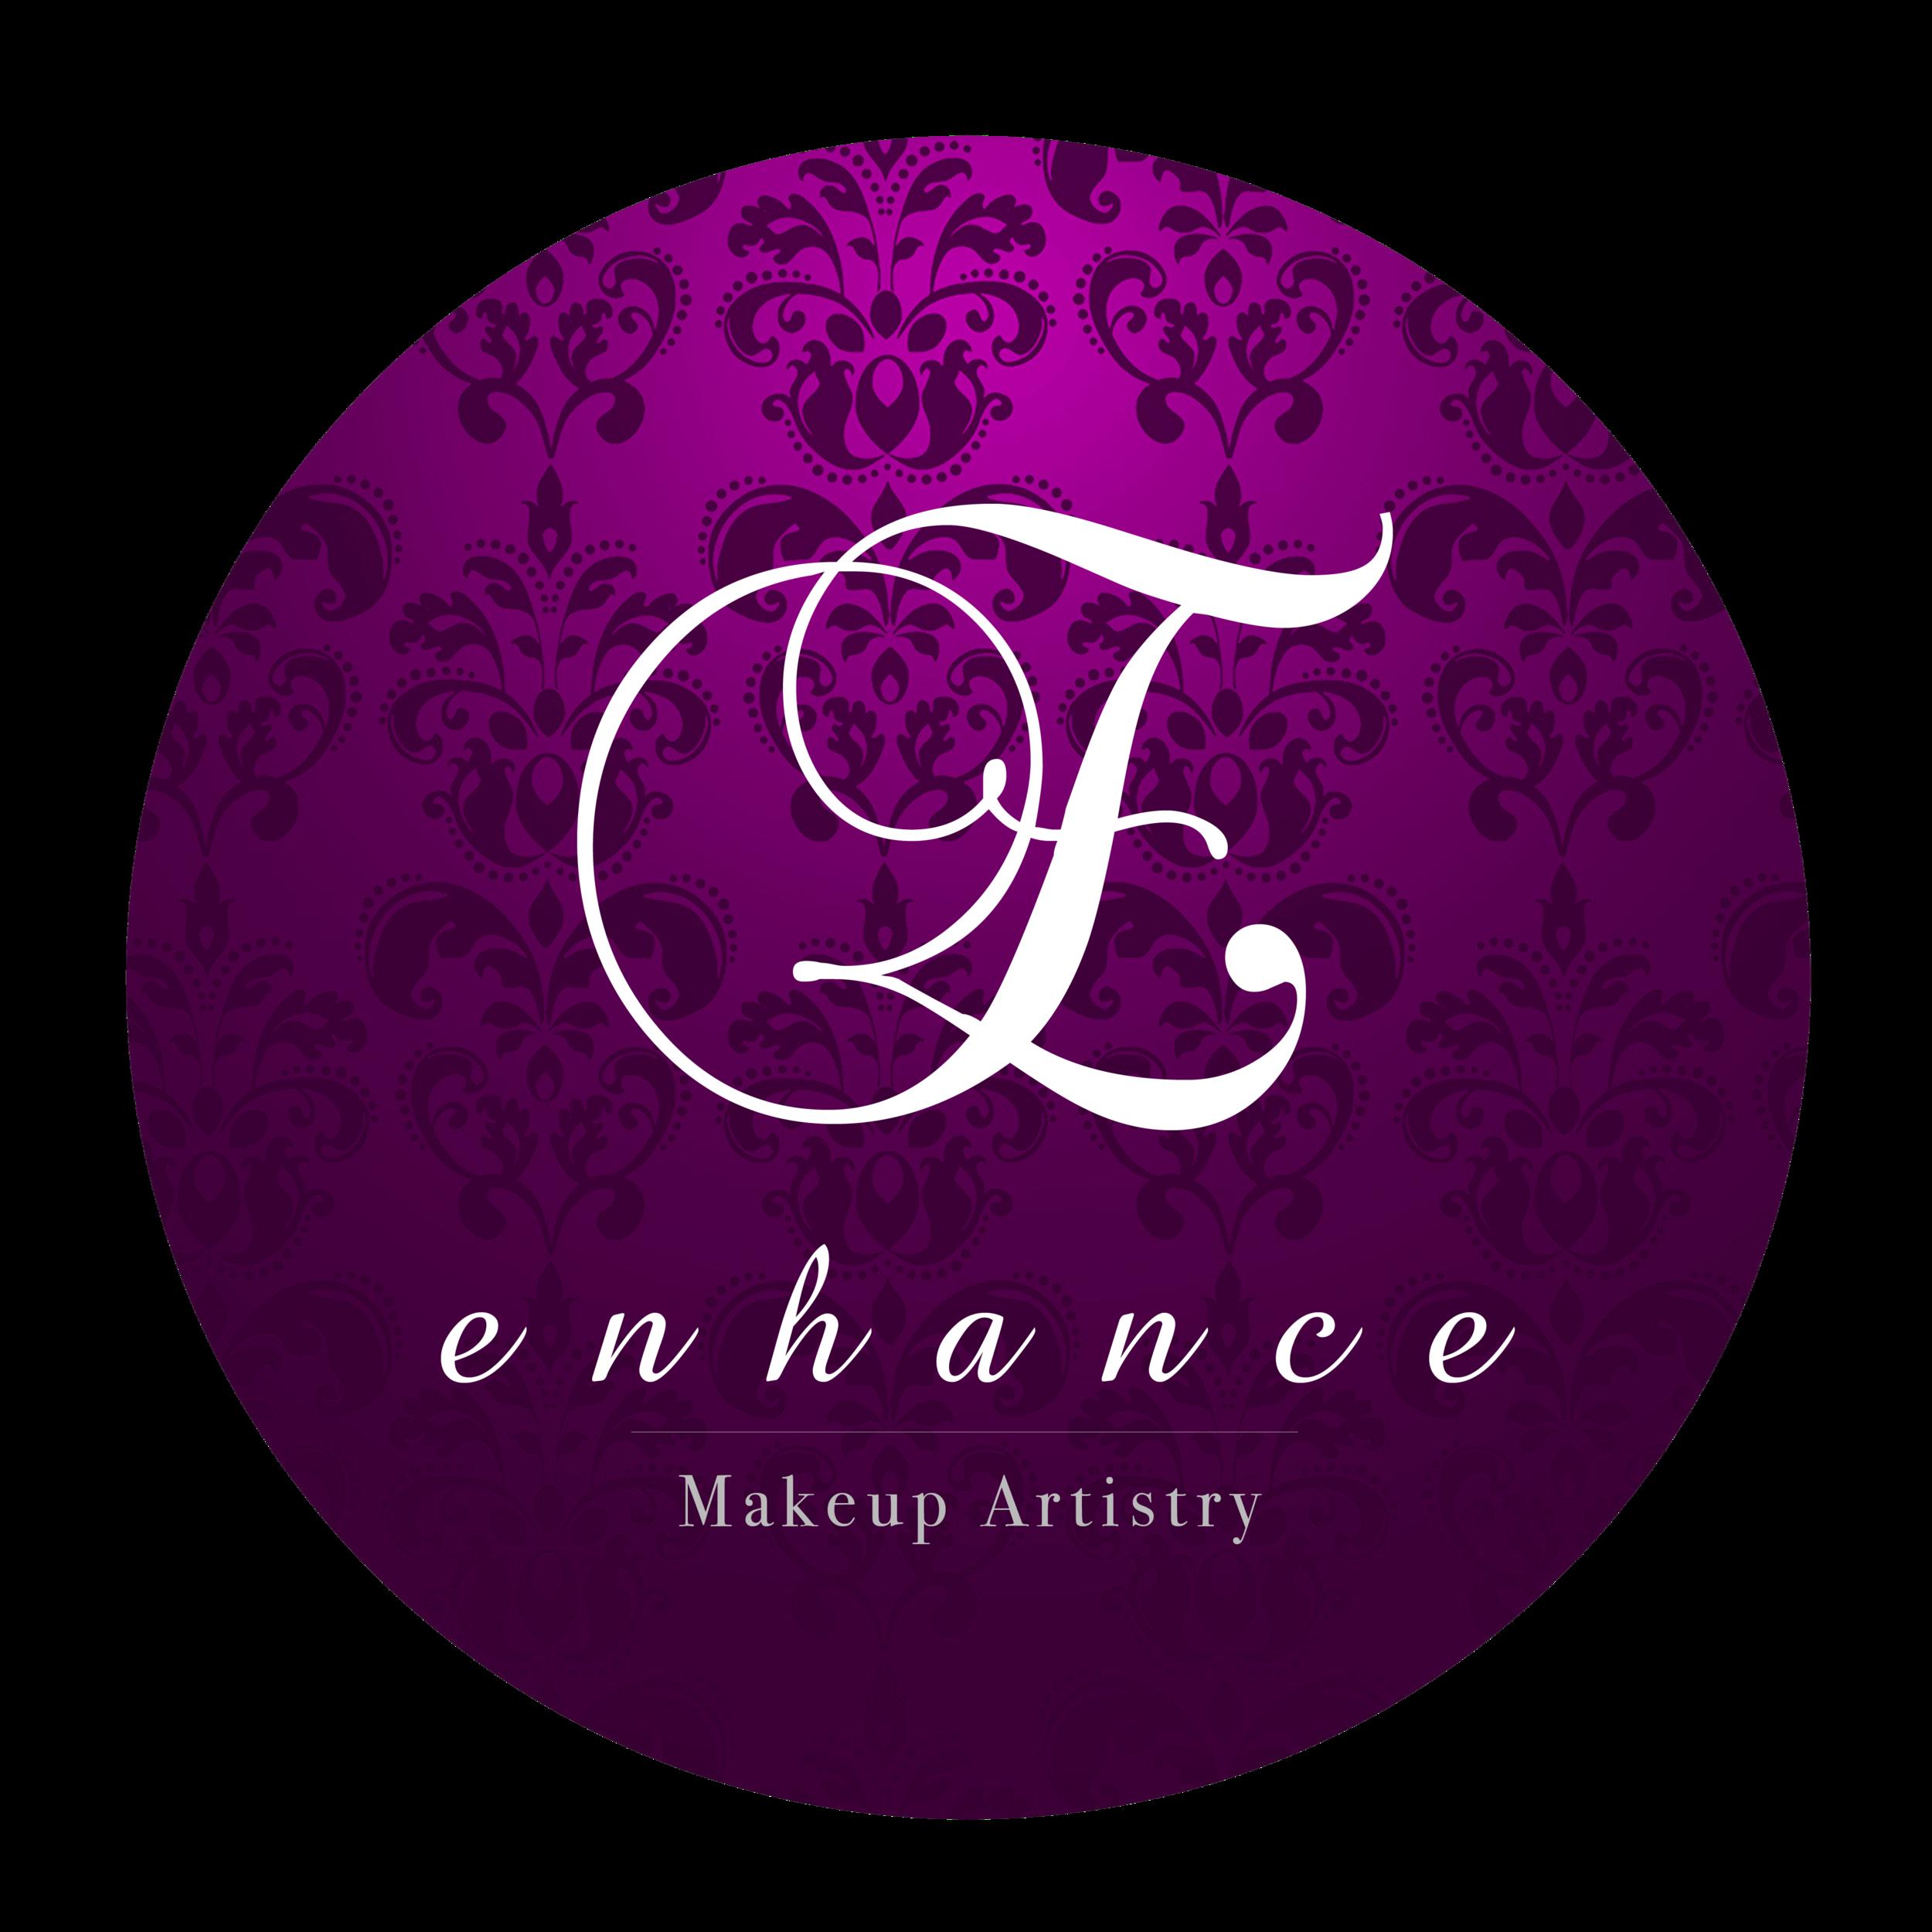 Enhance Logo 3.png